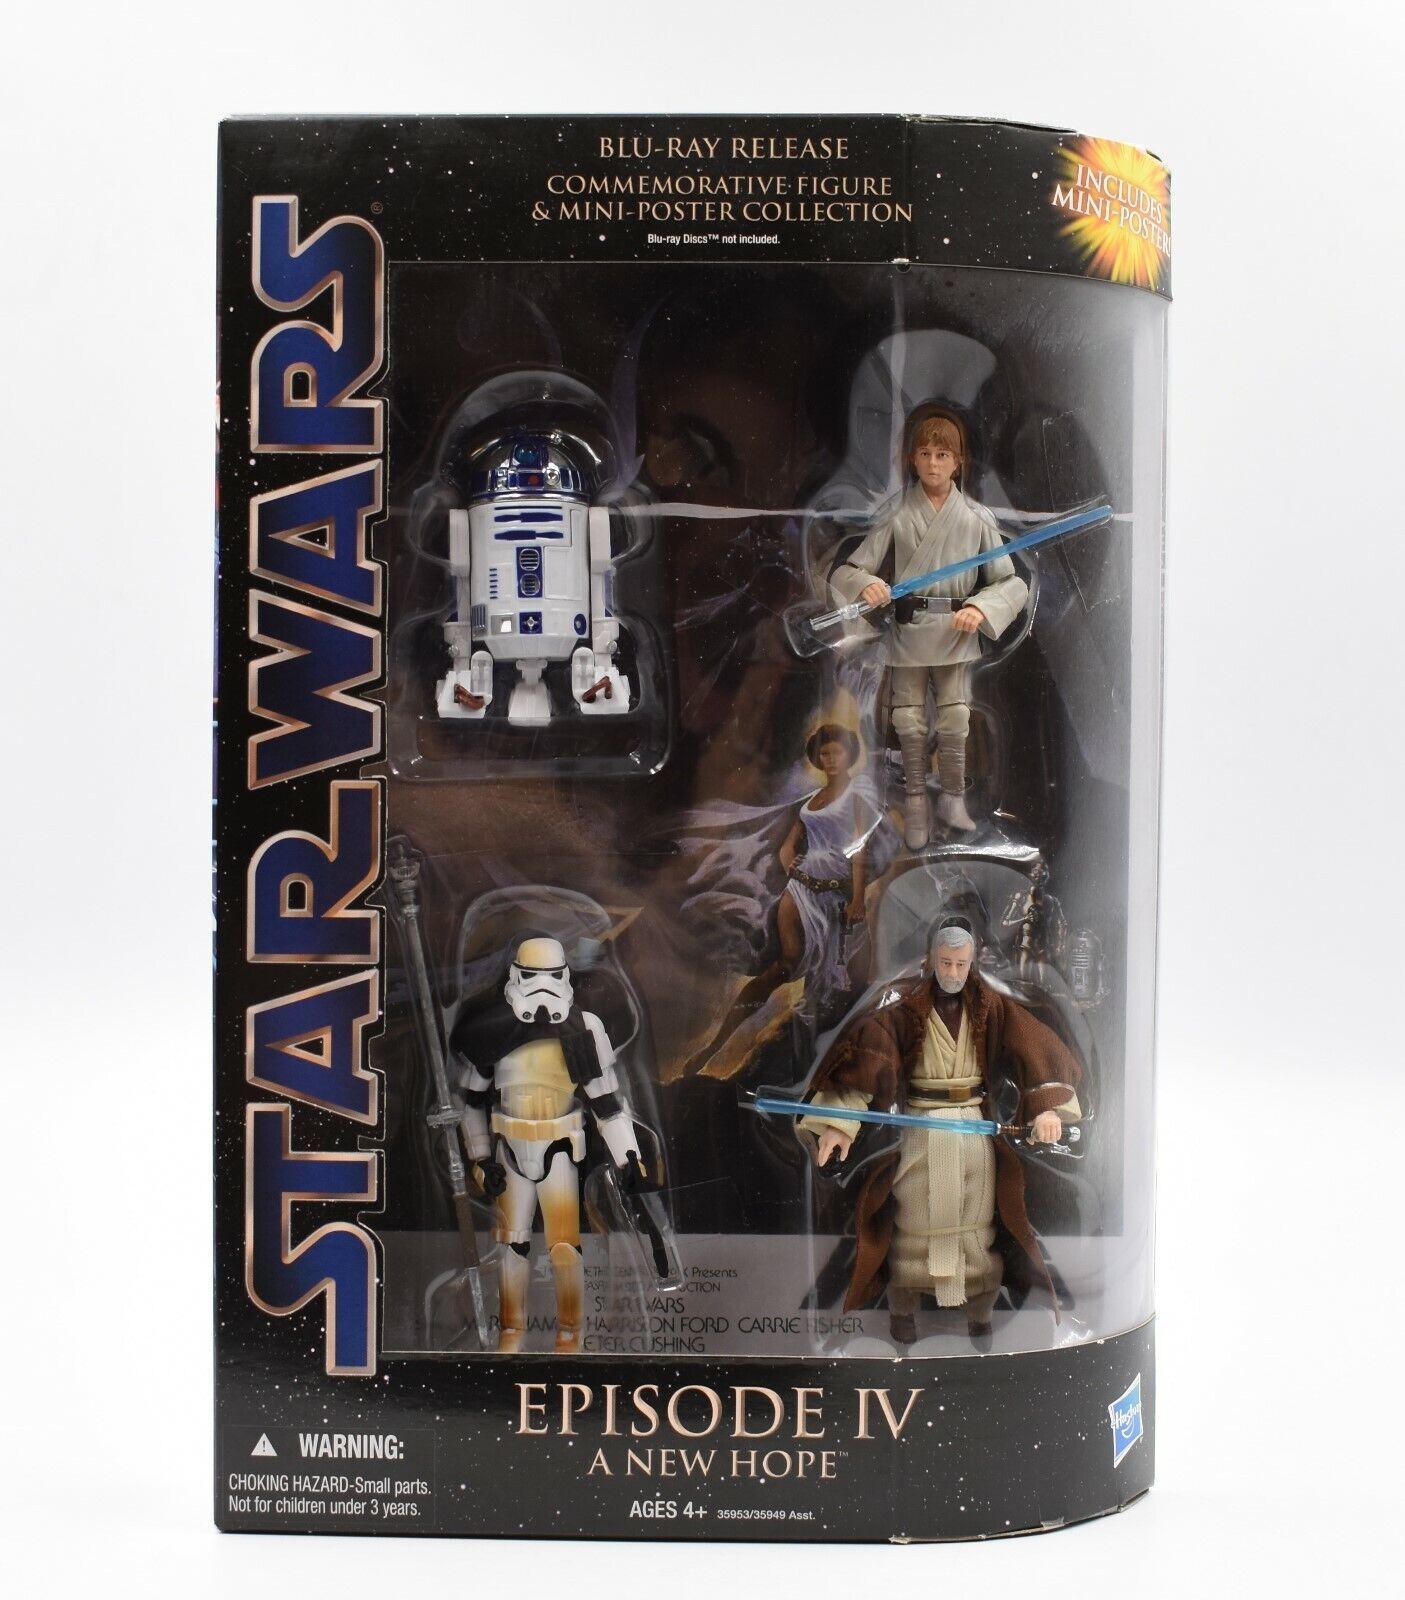 Guerra de las Galaxias episodio IV A New Hope Conmemorativa Acción Figura Colección